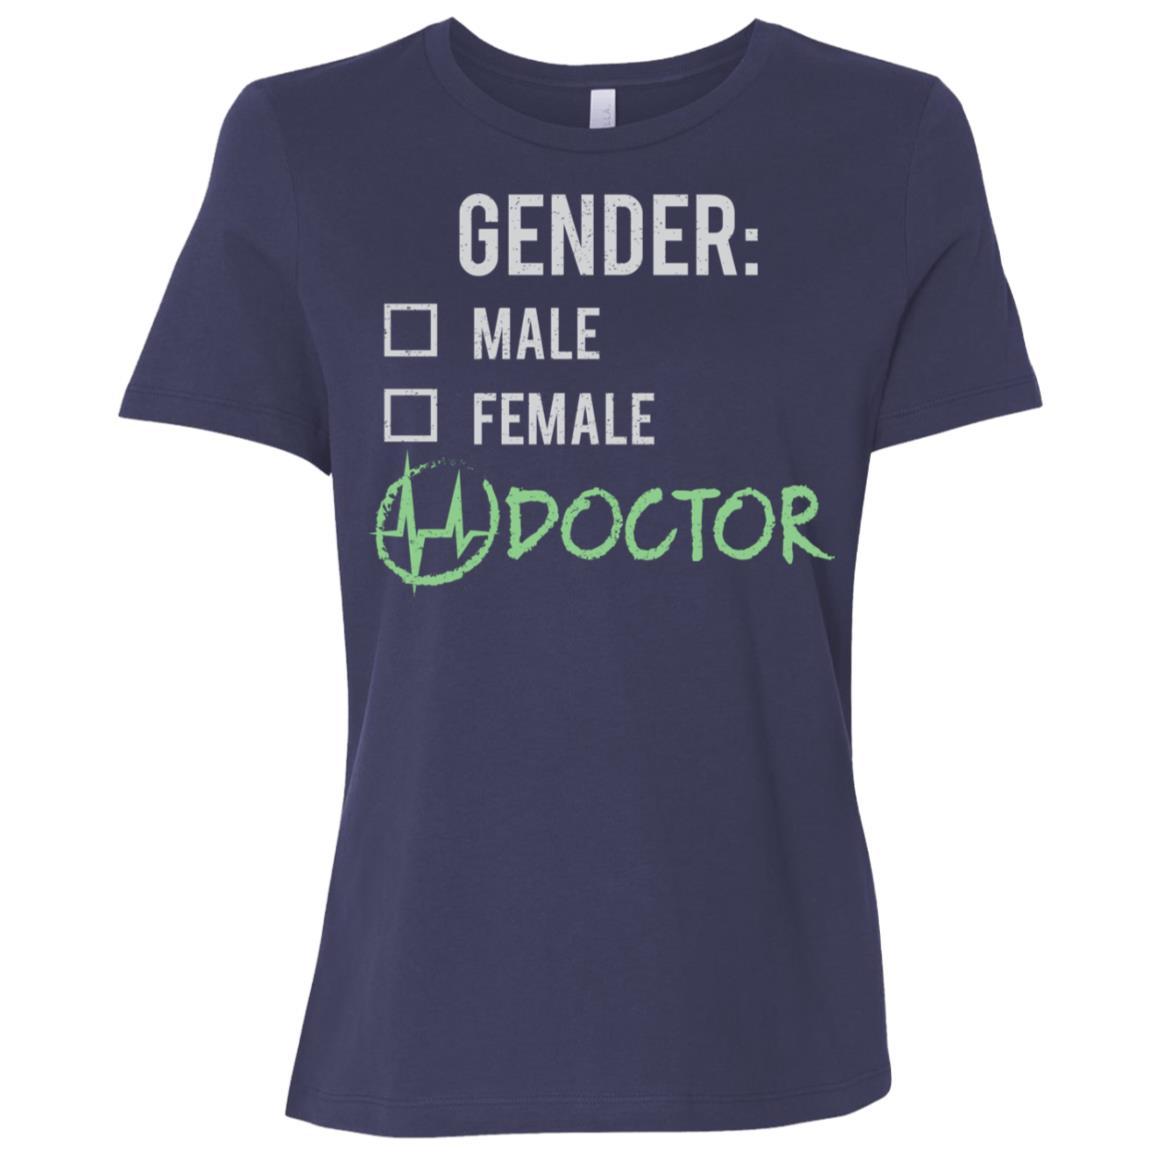 Male Female Doctor Gender Nonbinary Trans Women Short Sleeve T-Shirt